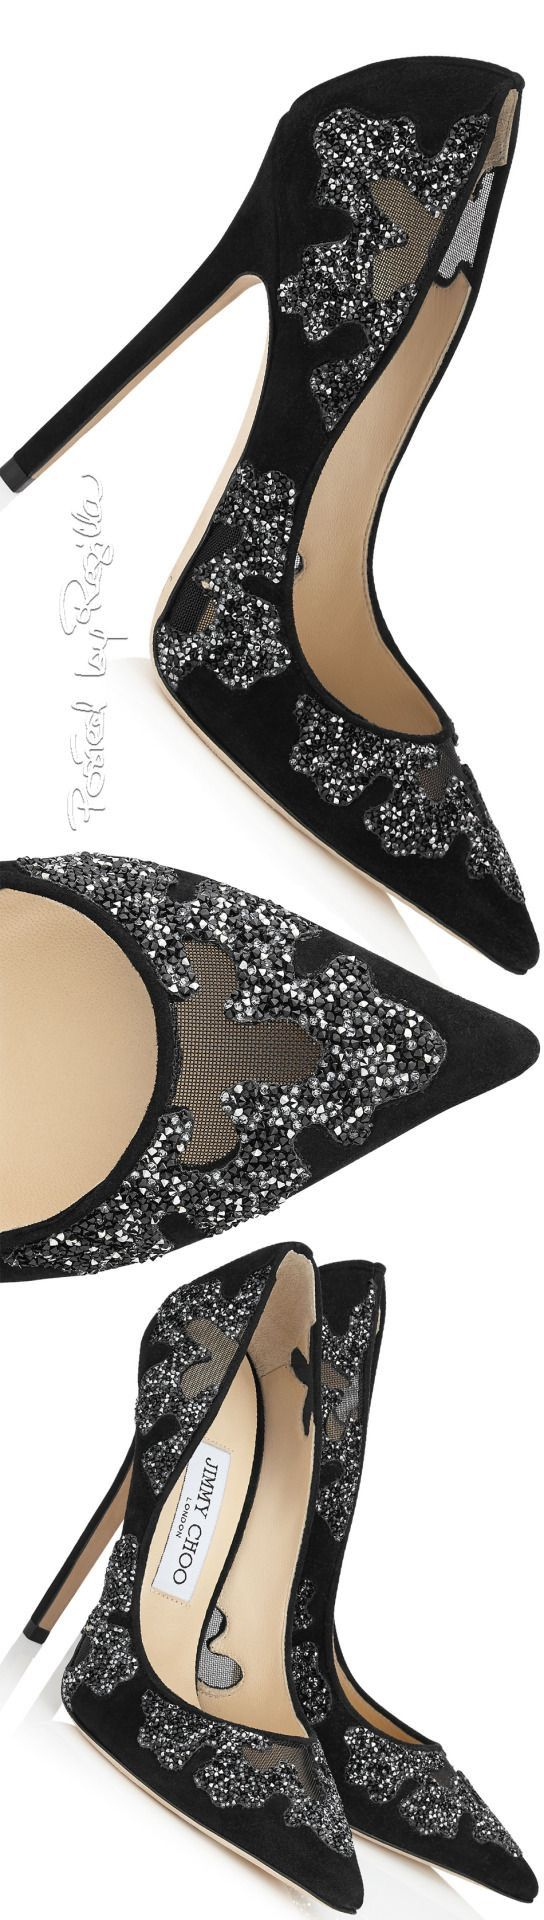 Rosamaria G Frangini | High Shoes | Shoe Addict |